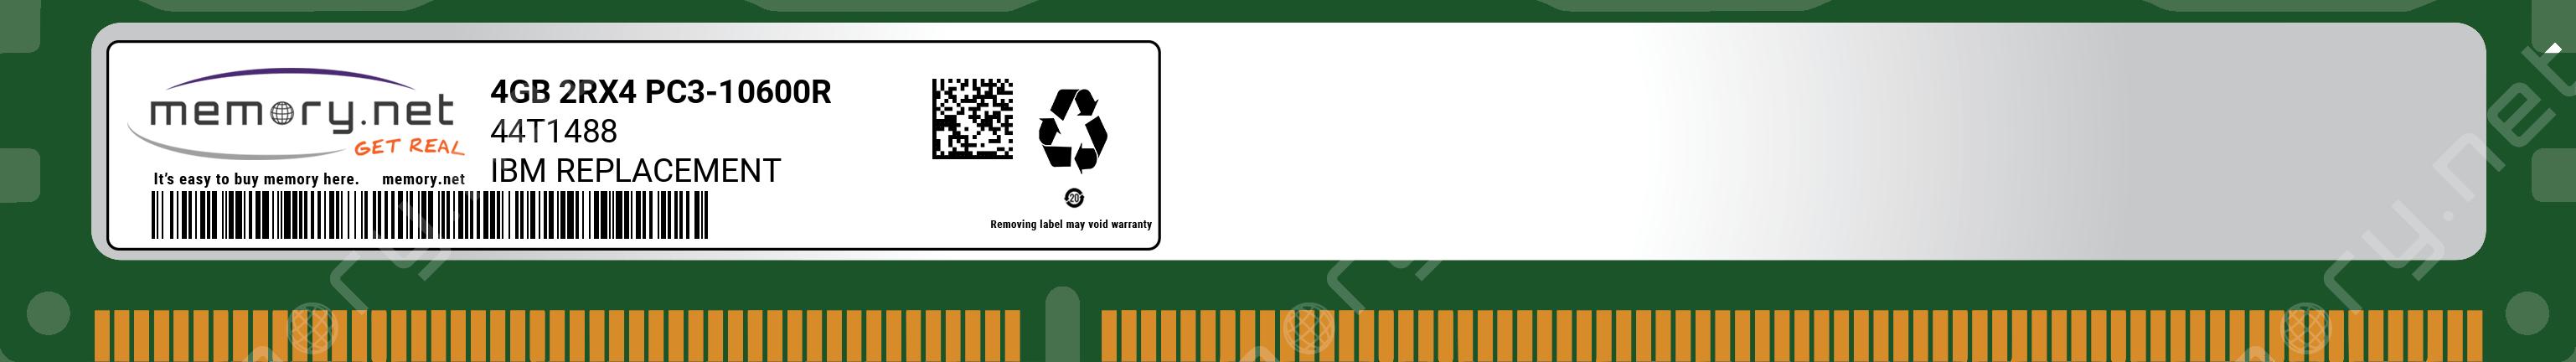 44T1488